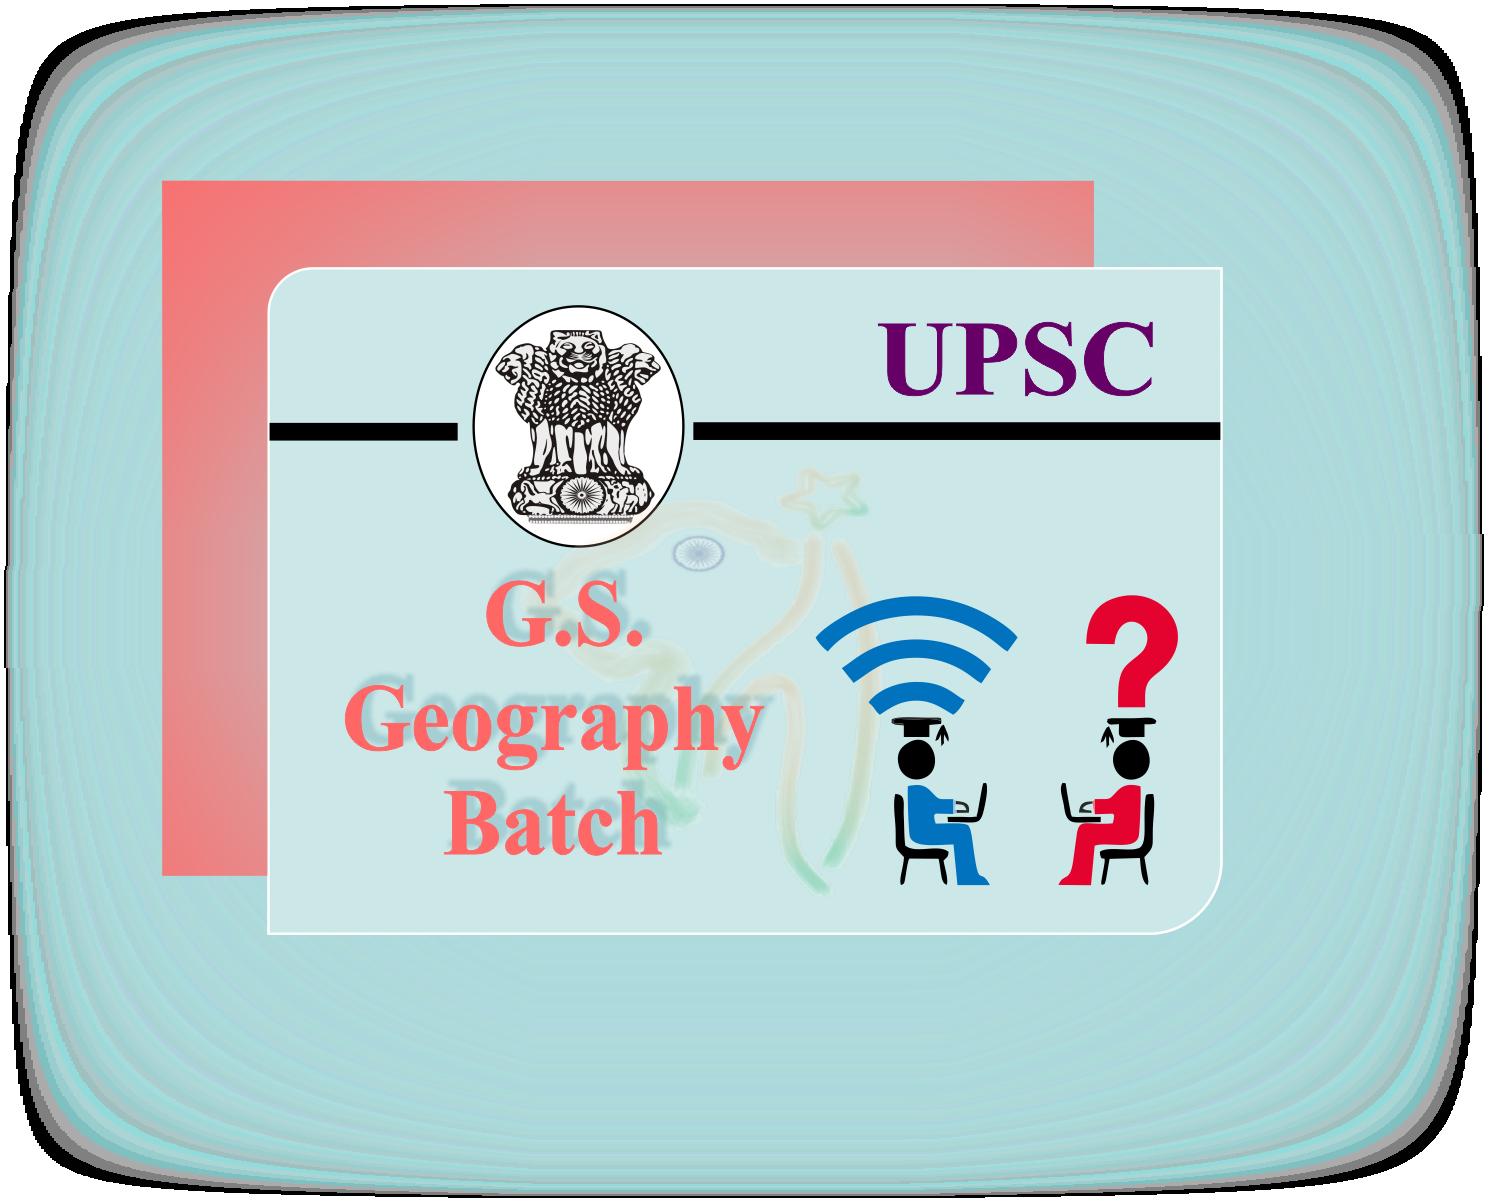 UPSC GS- Geography Batch